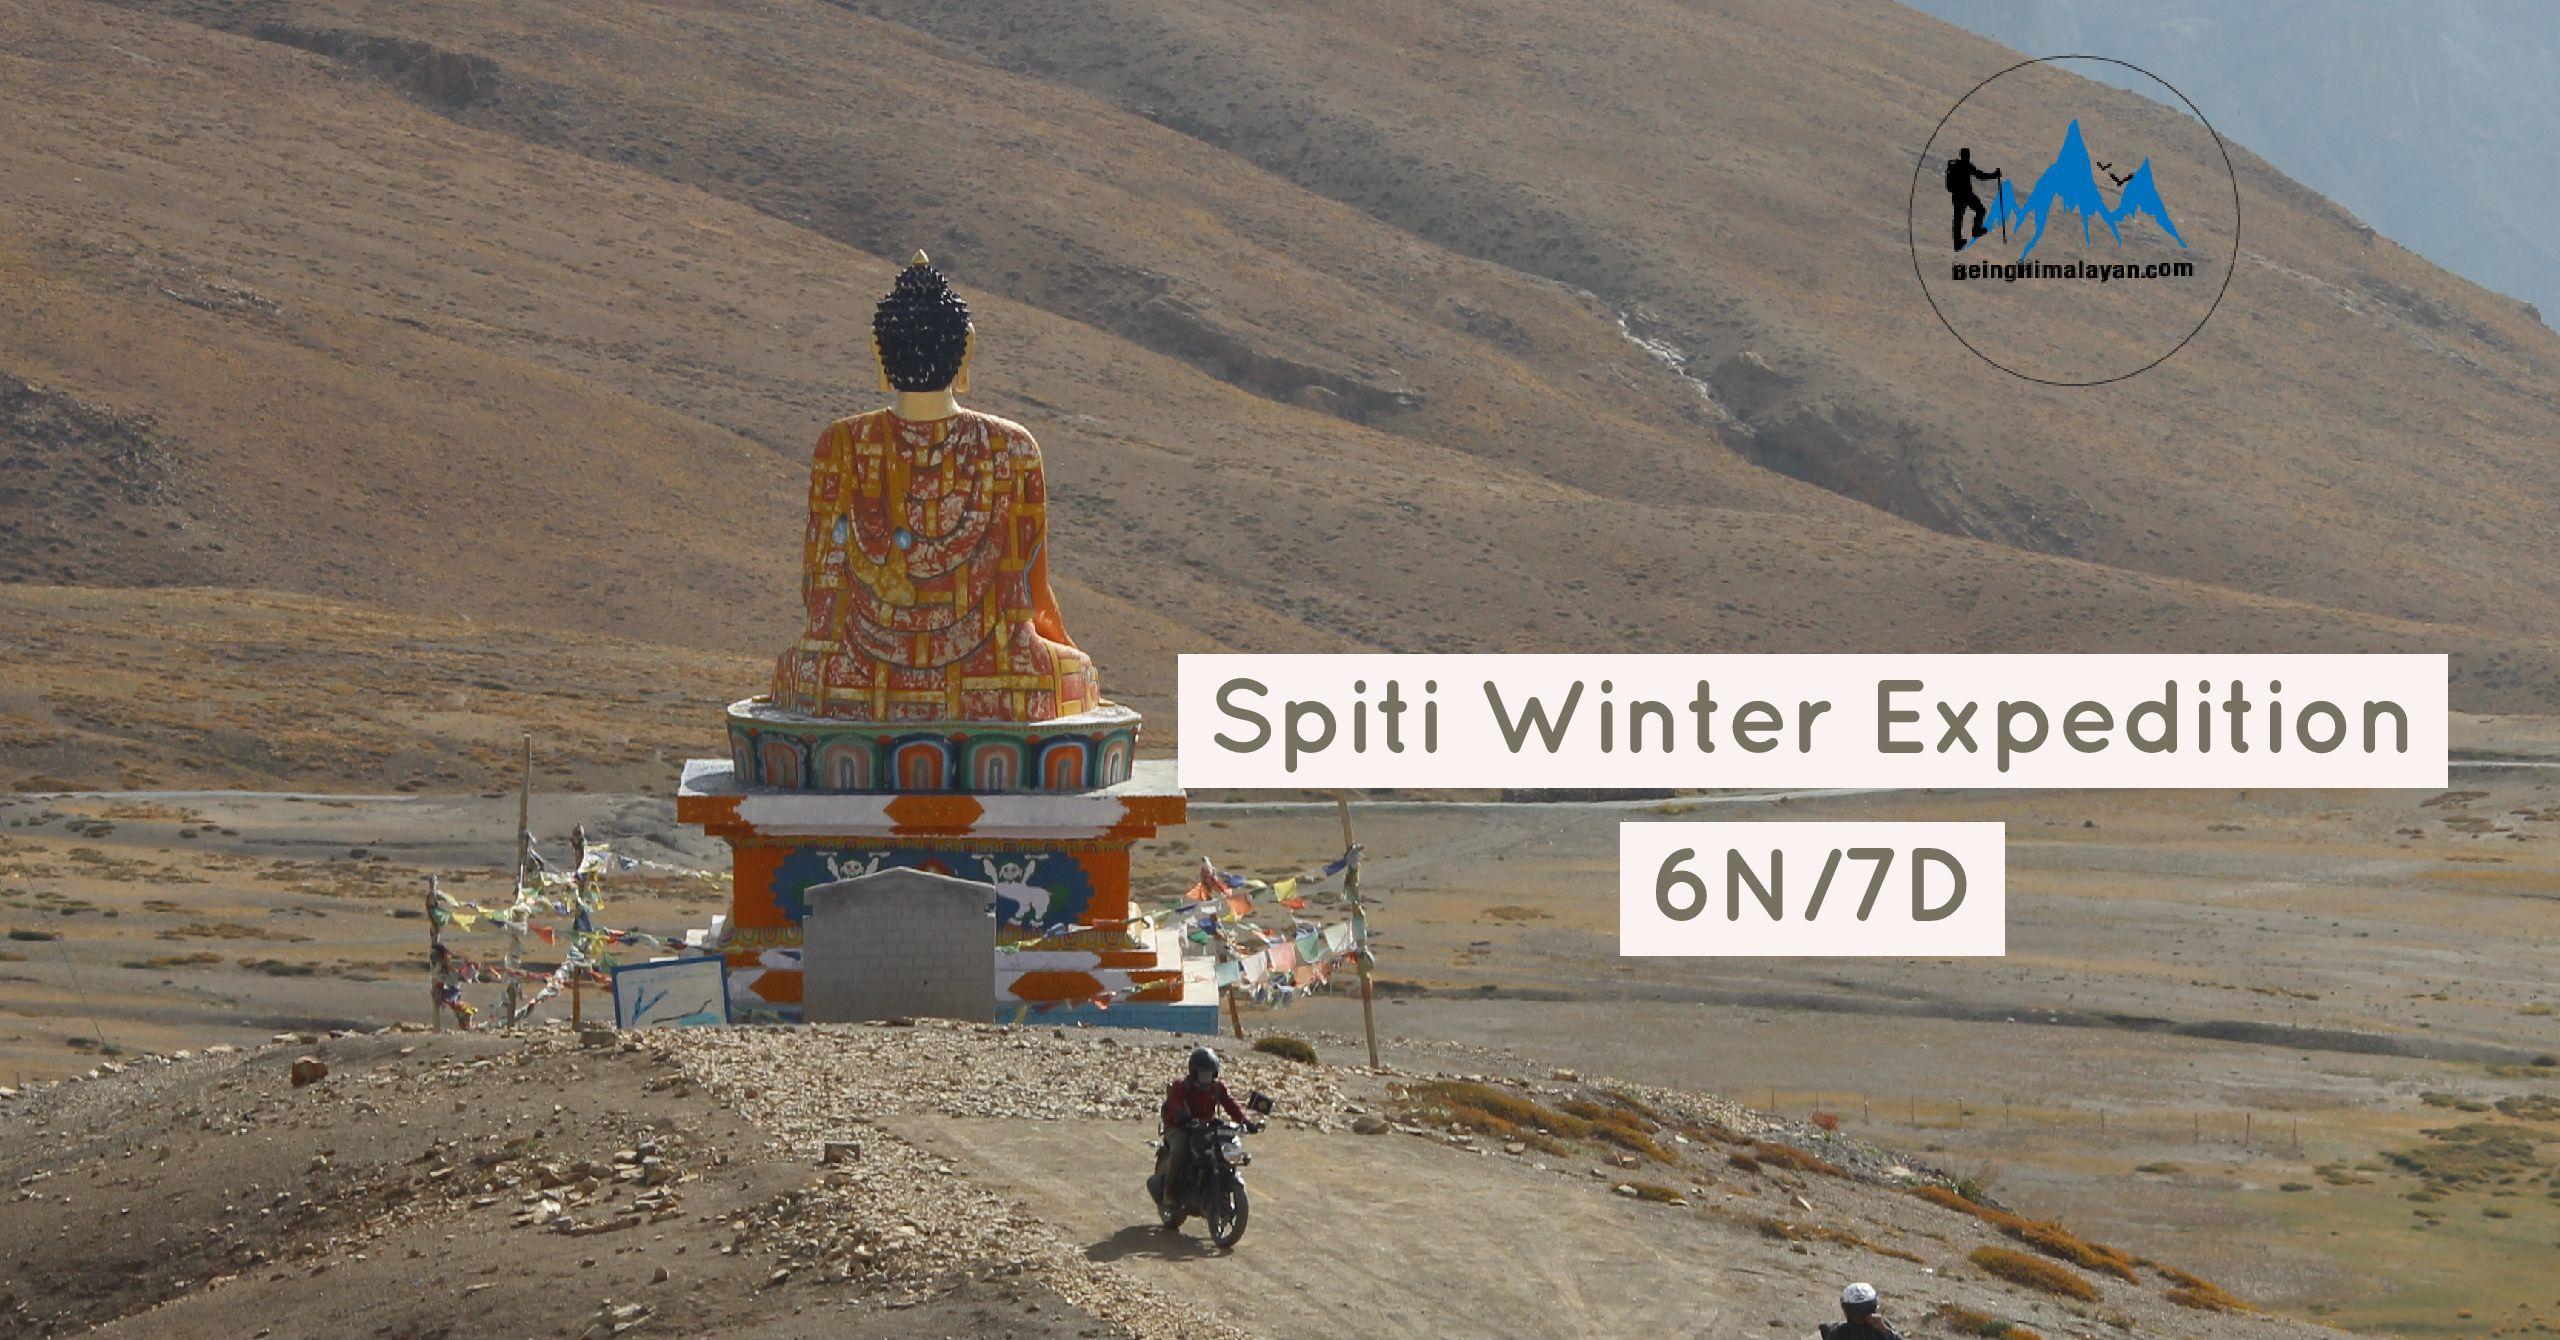 Spiti Winter Expedition